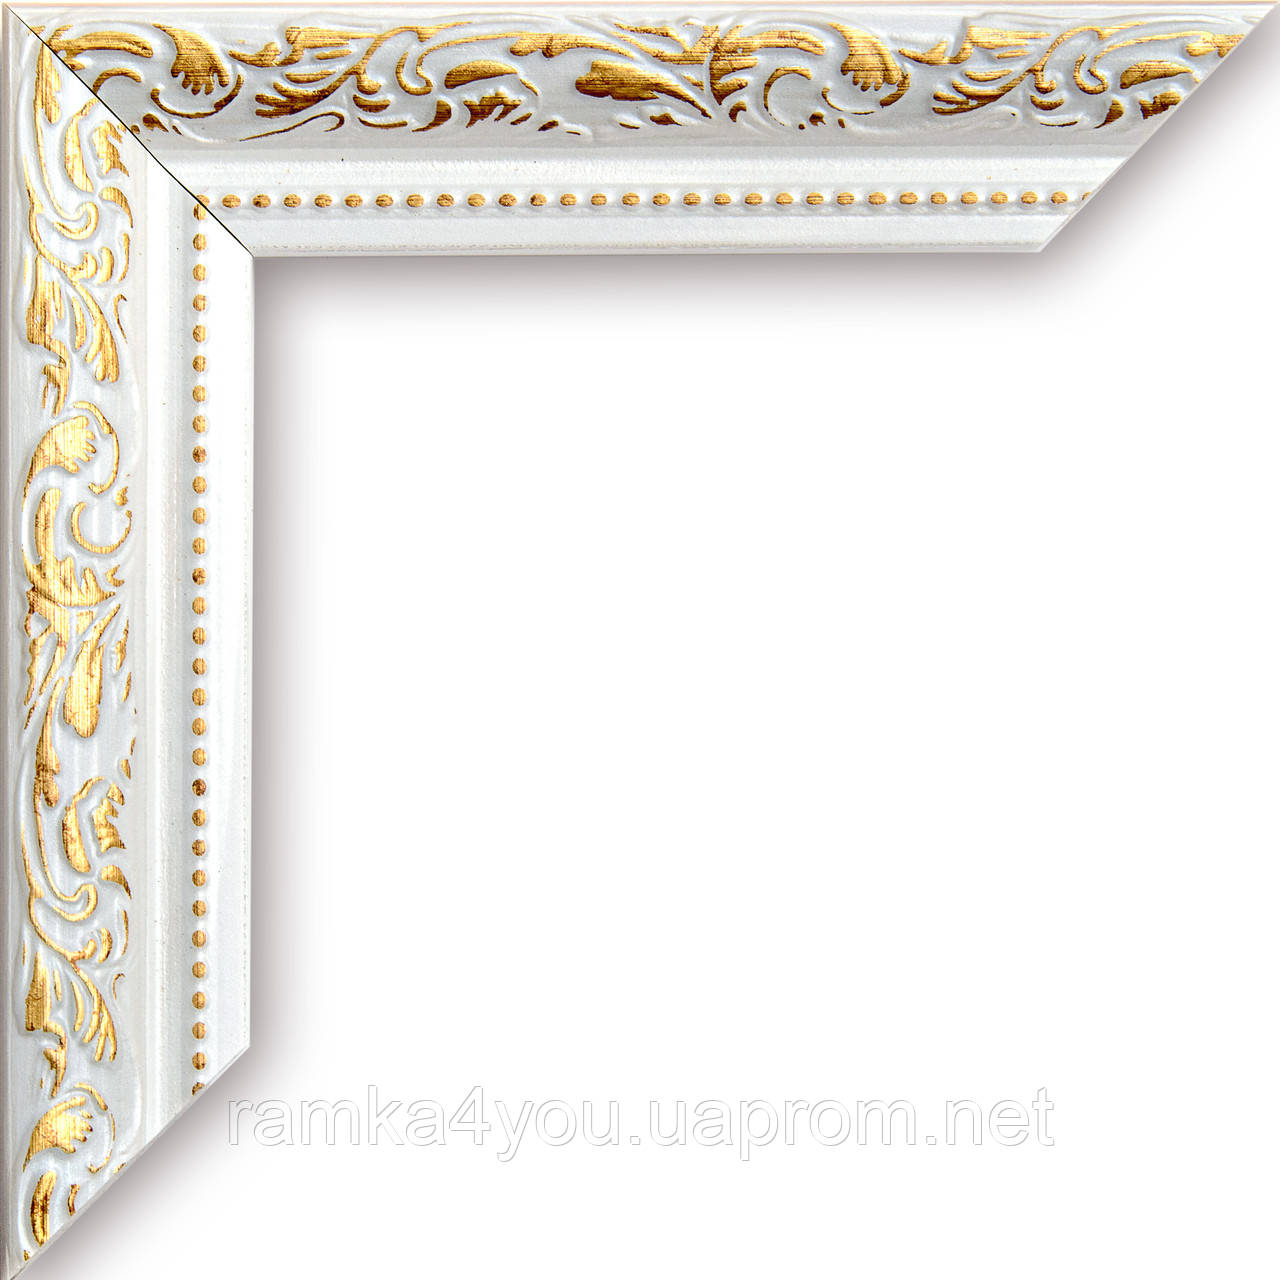 Рамка для зеркала белая ширина 3 см